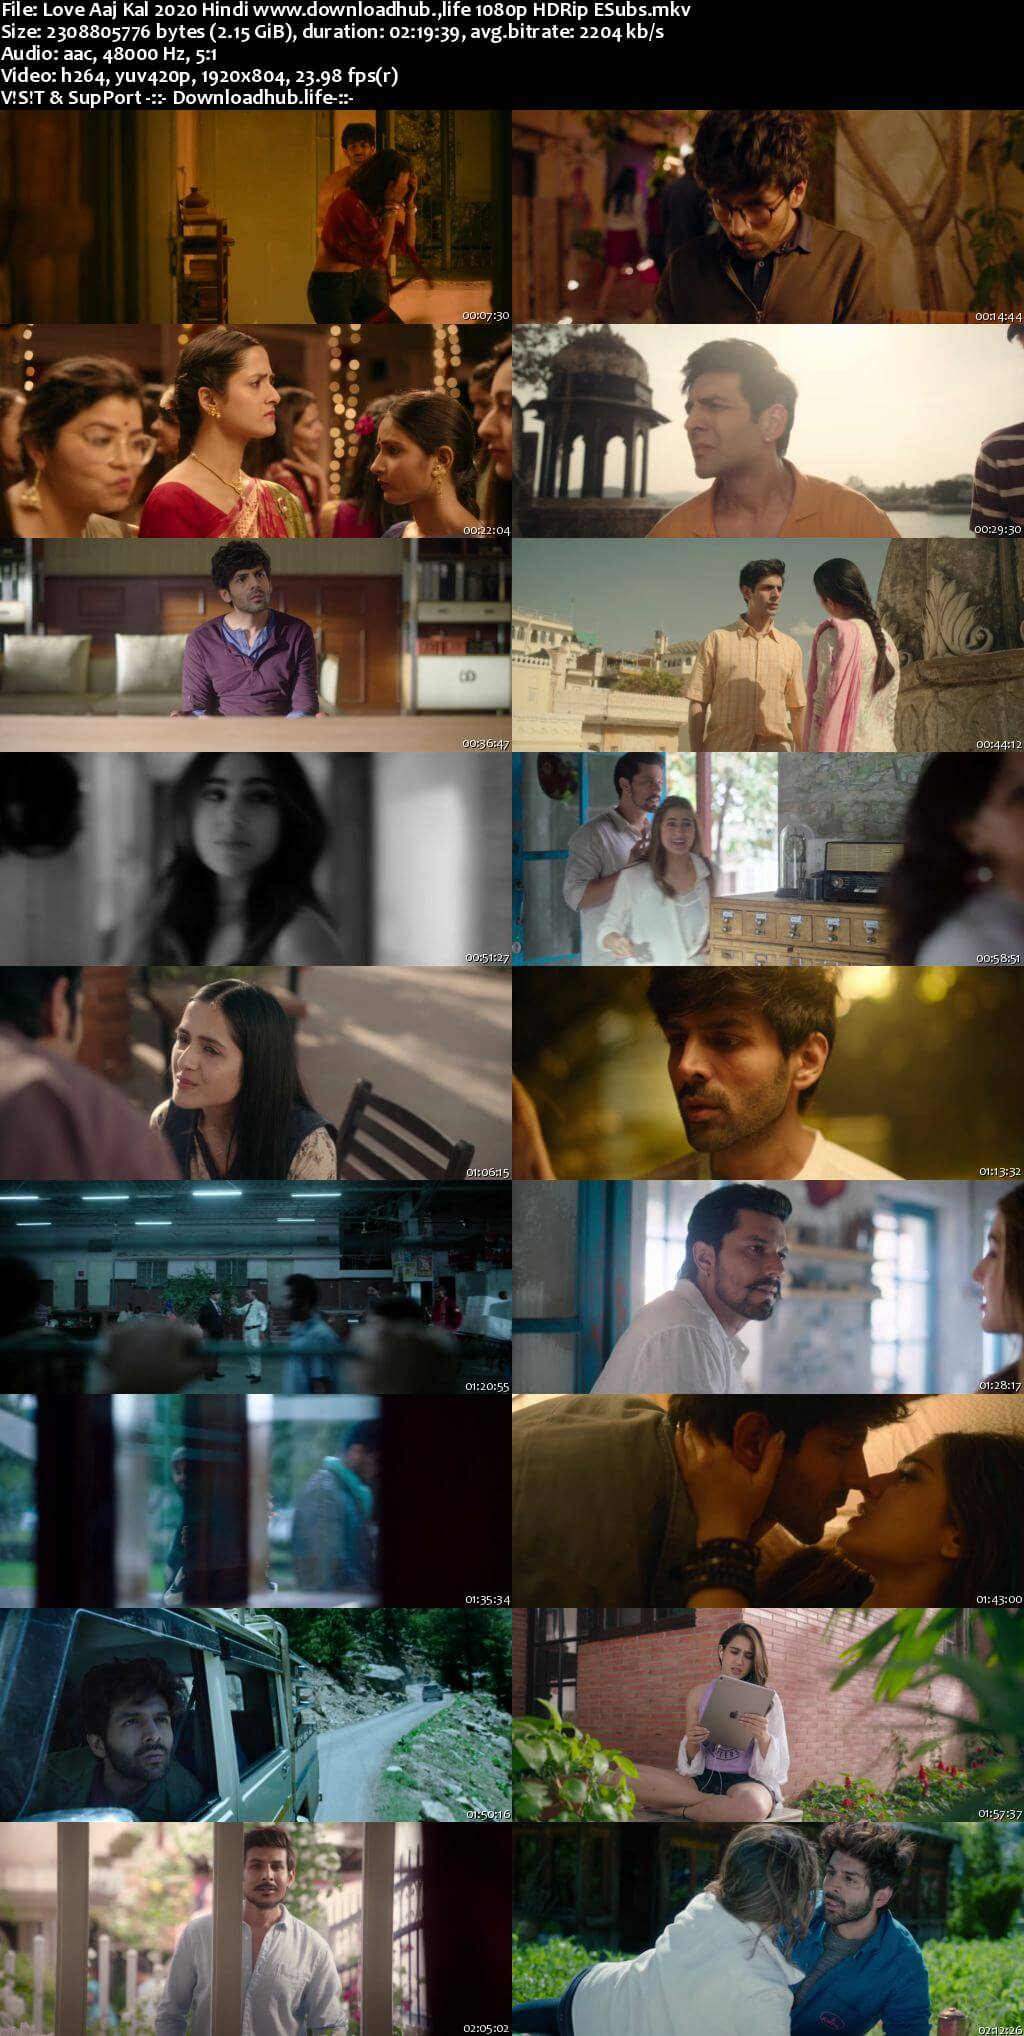 Love Aaj Kal 2020 Hindi 1080p HDRip ESubs